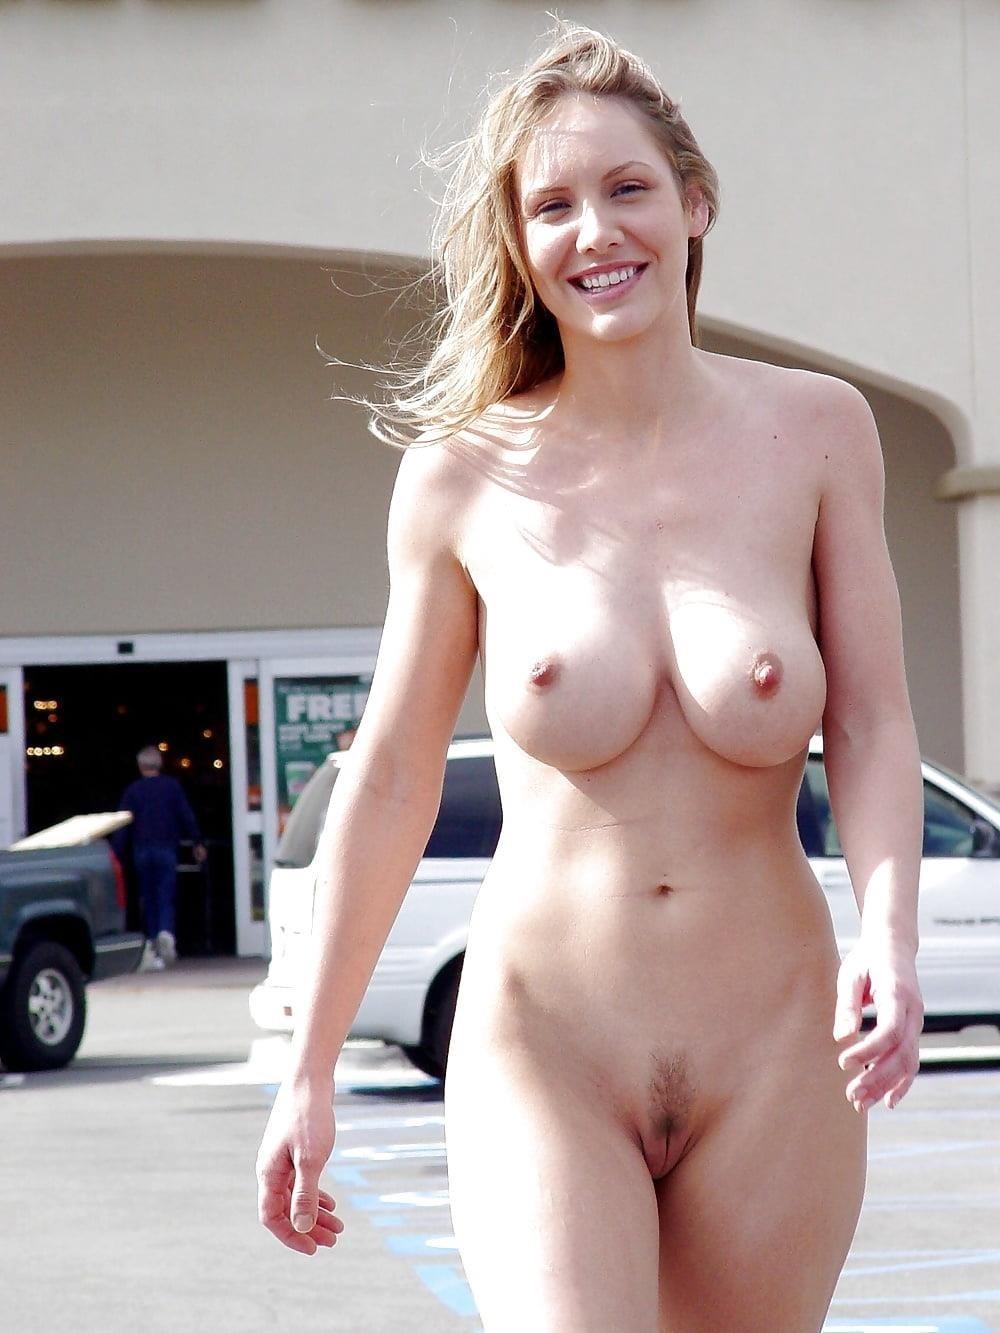 Girls peeing outside naked-2951